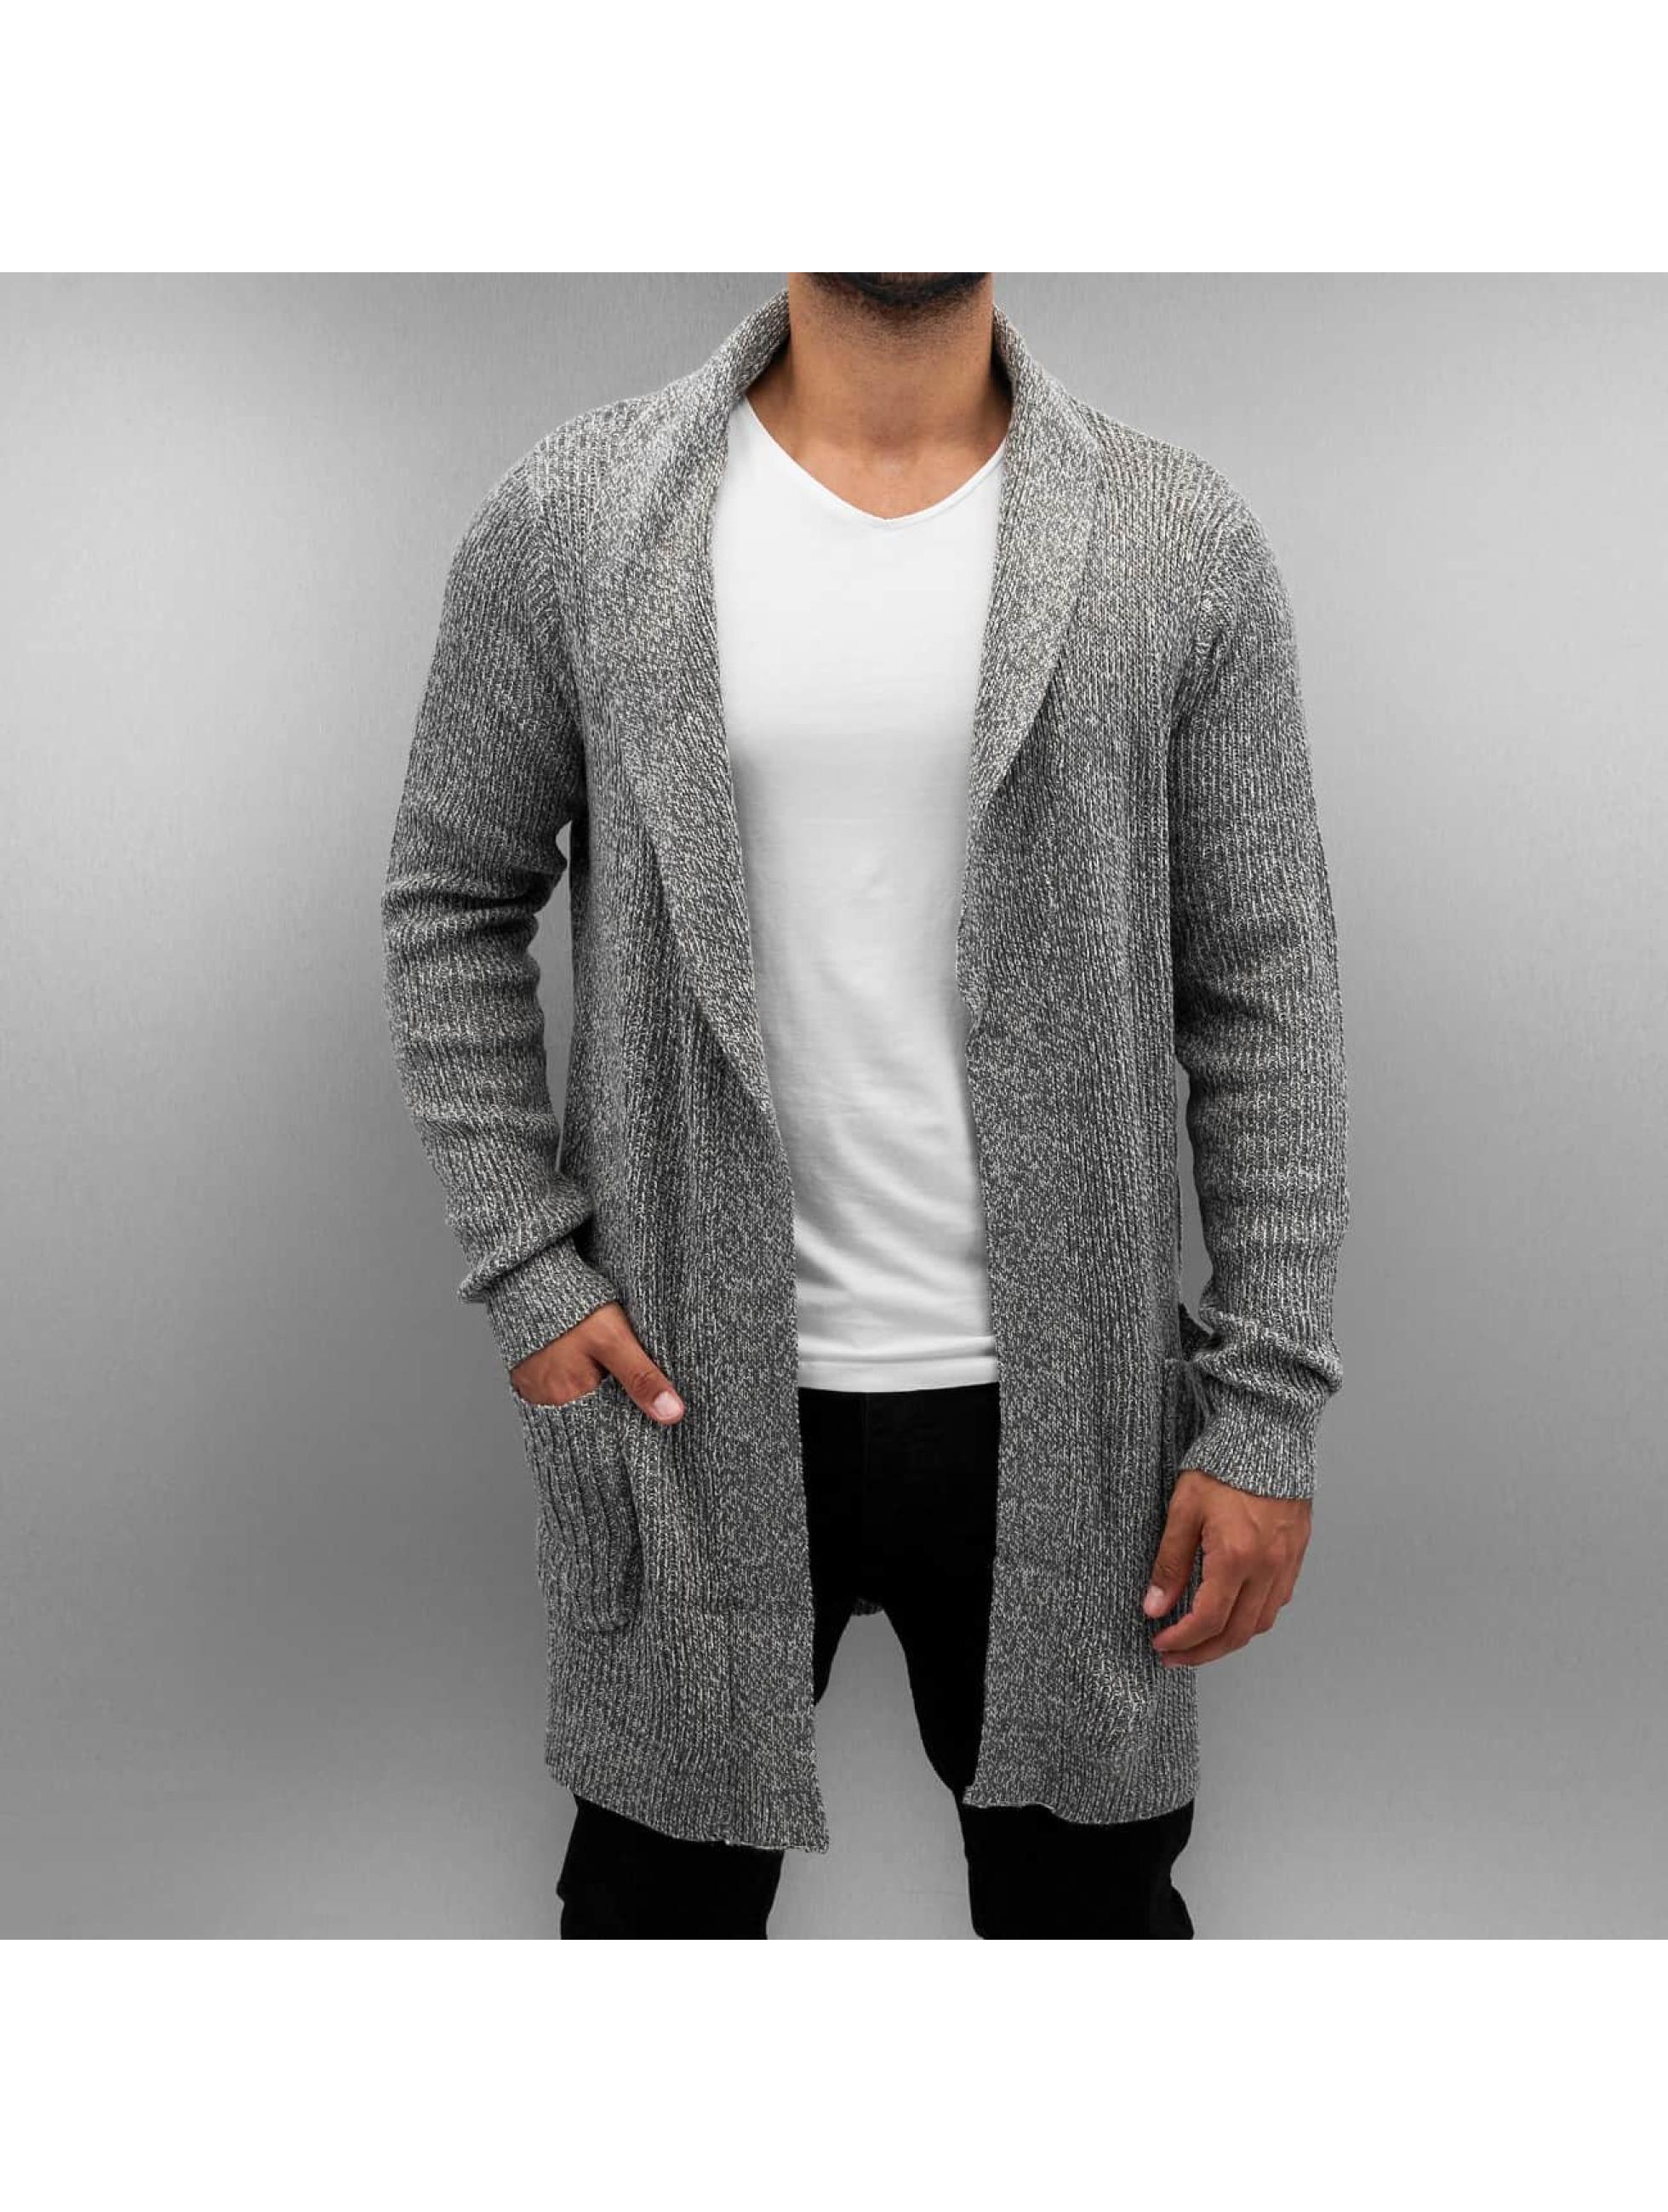 Strickjacke Knit in grau